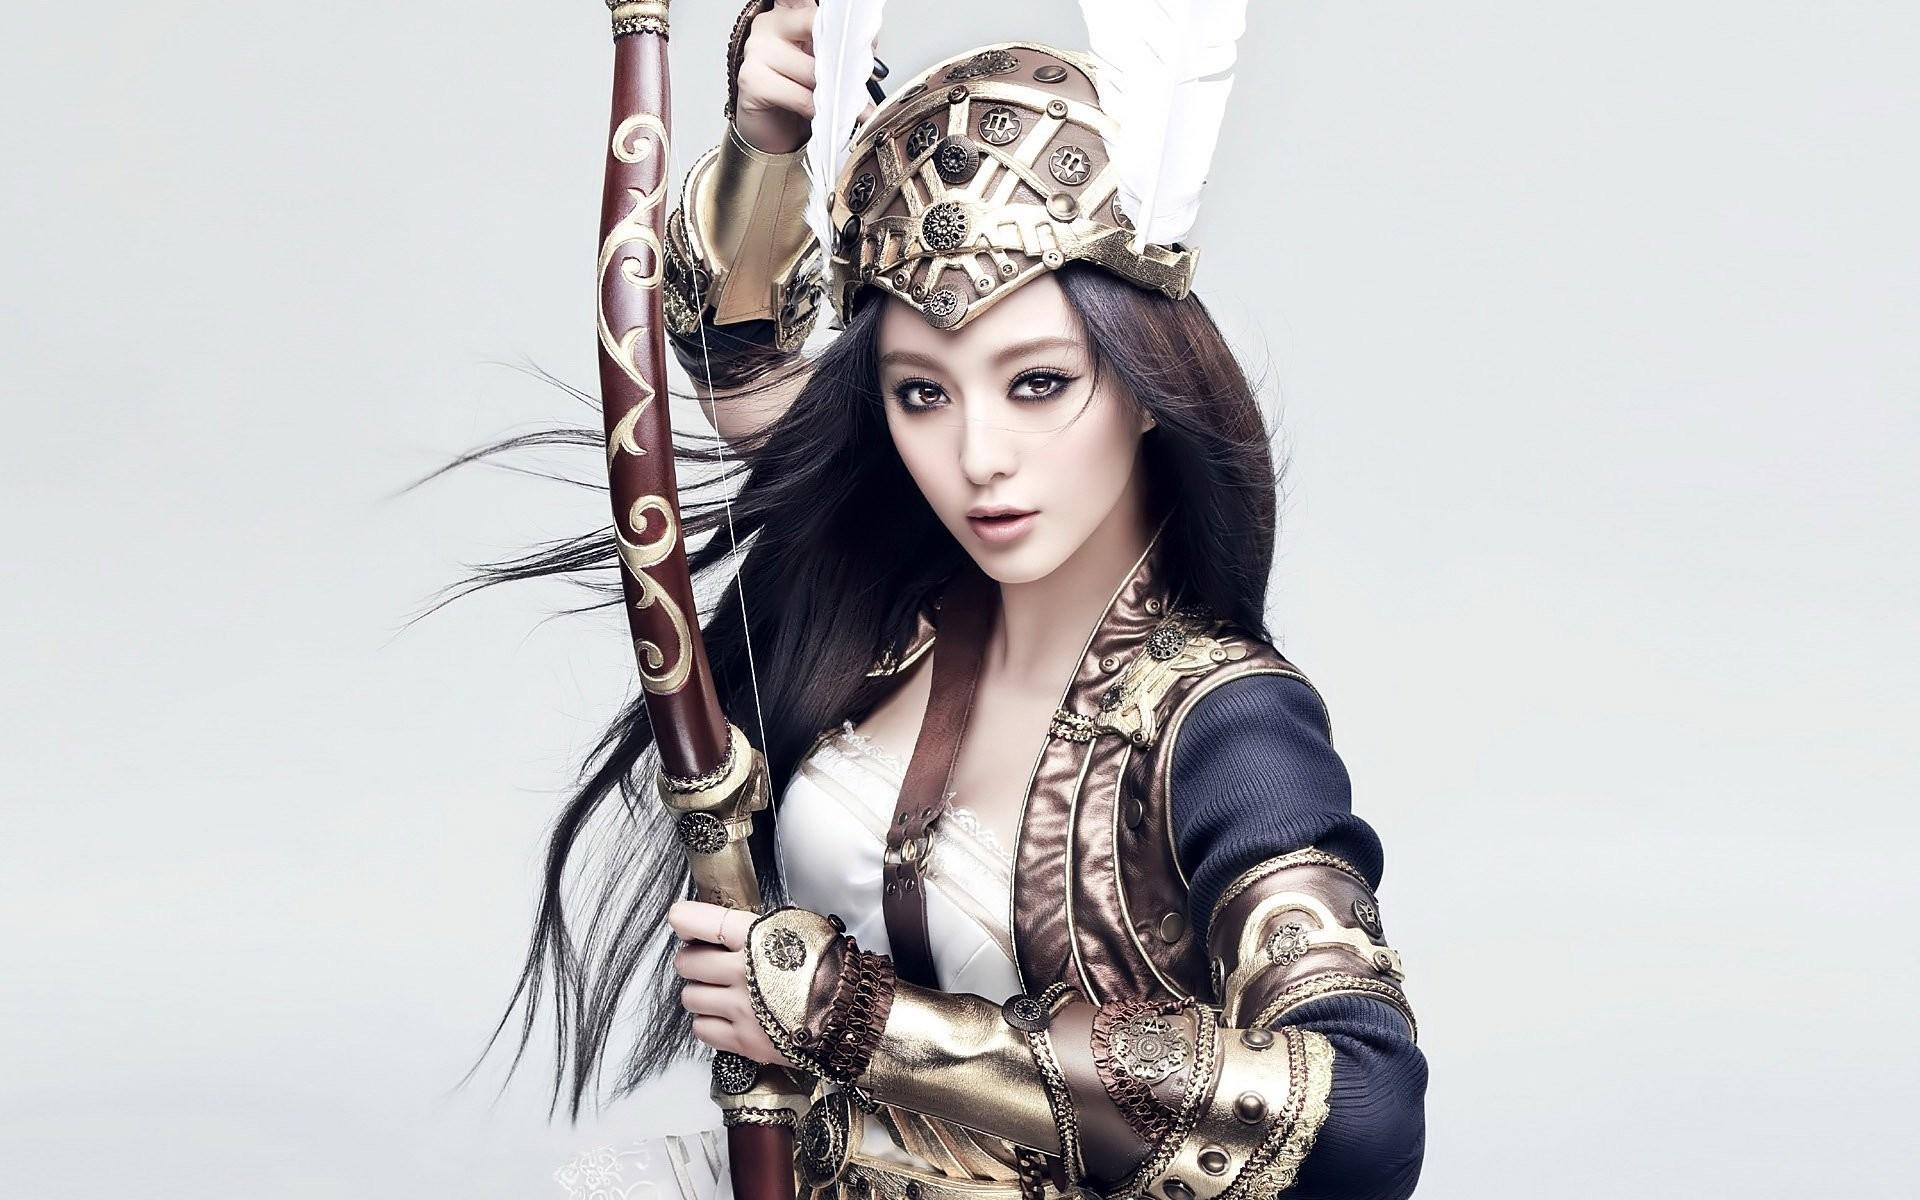 Fantasy Warrior Girl 206135